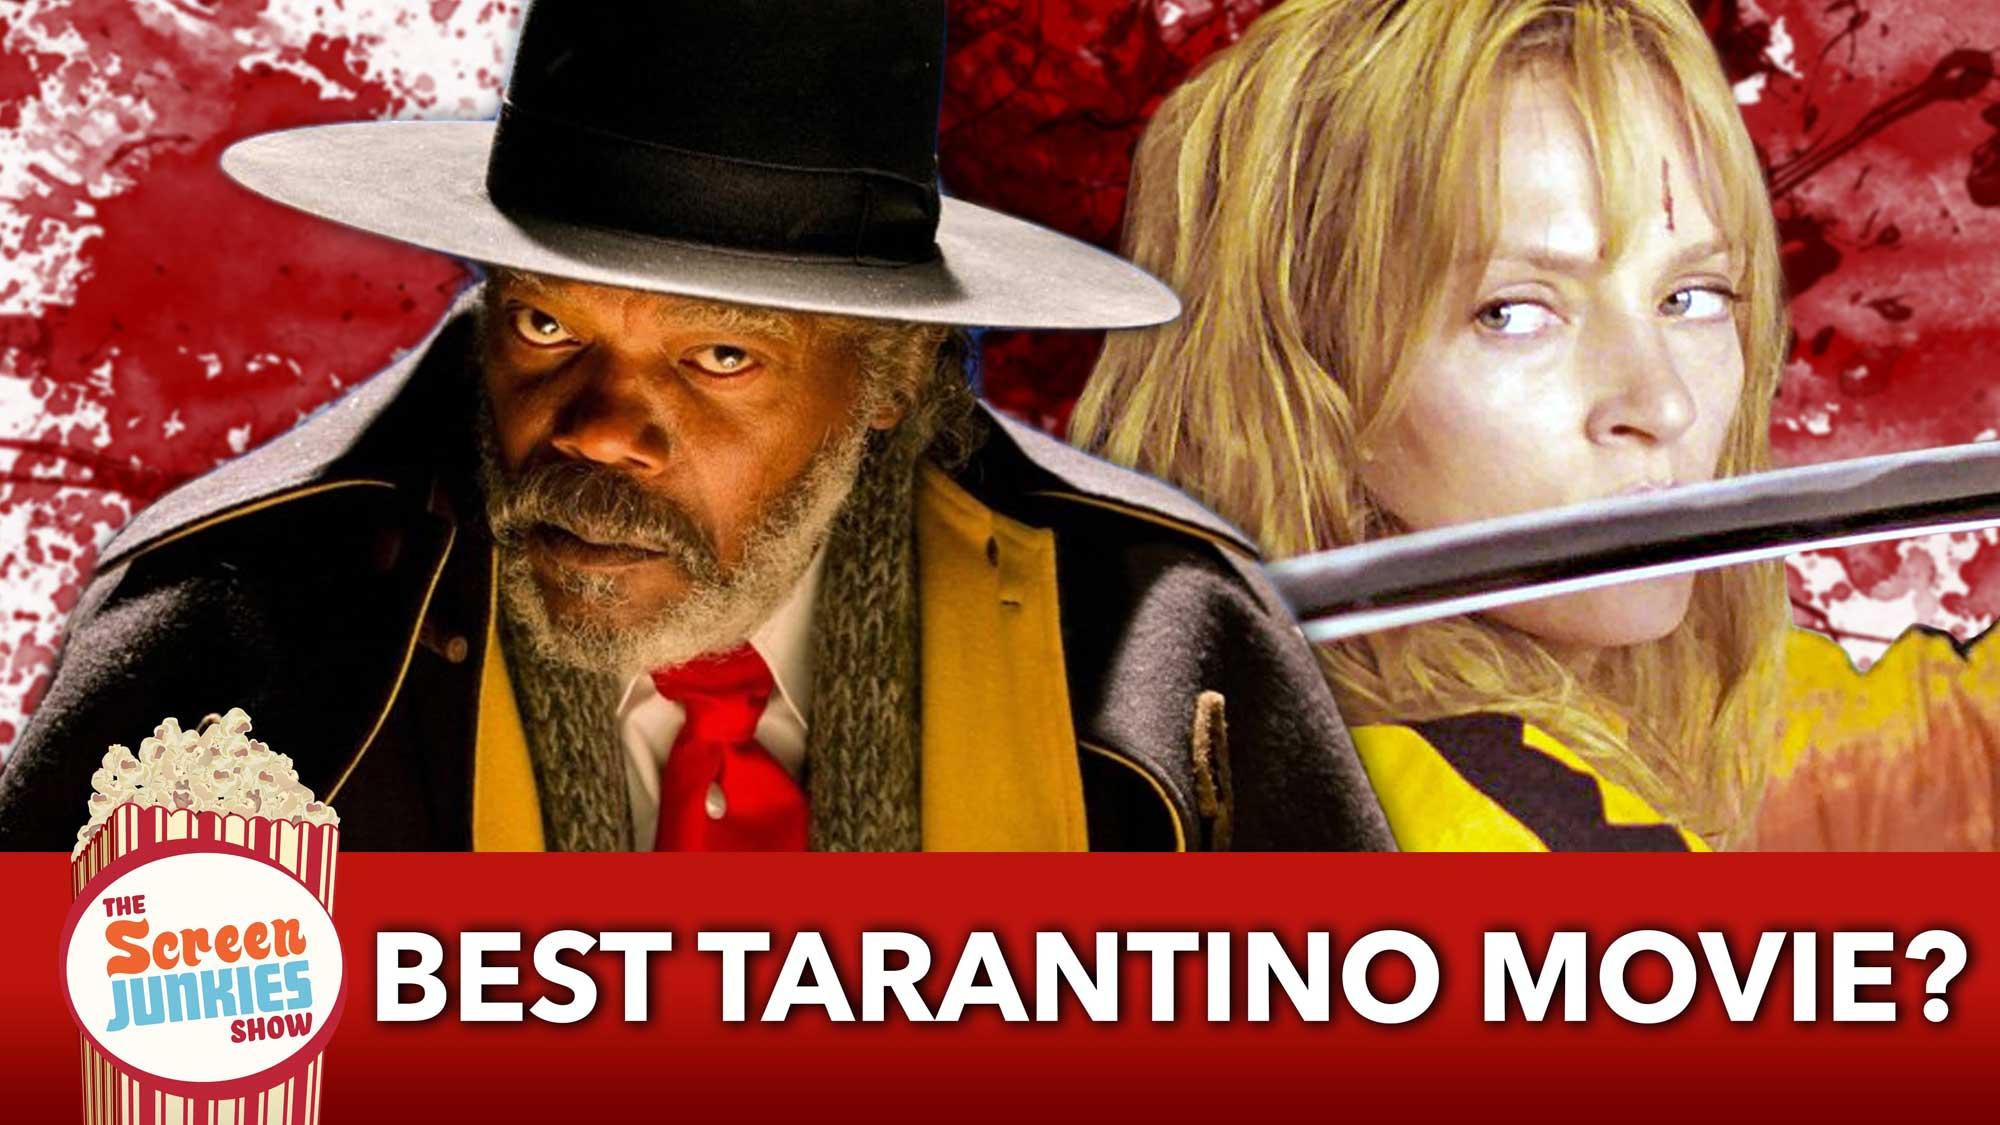 Screen Junkies: Best Tarantino Movie?